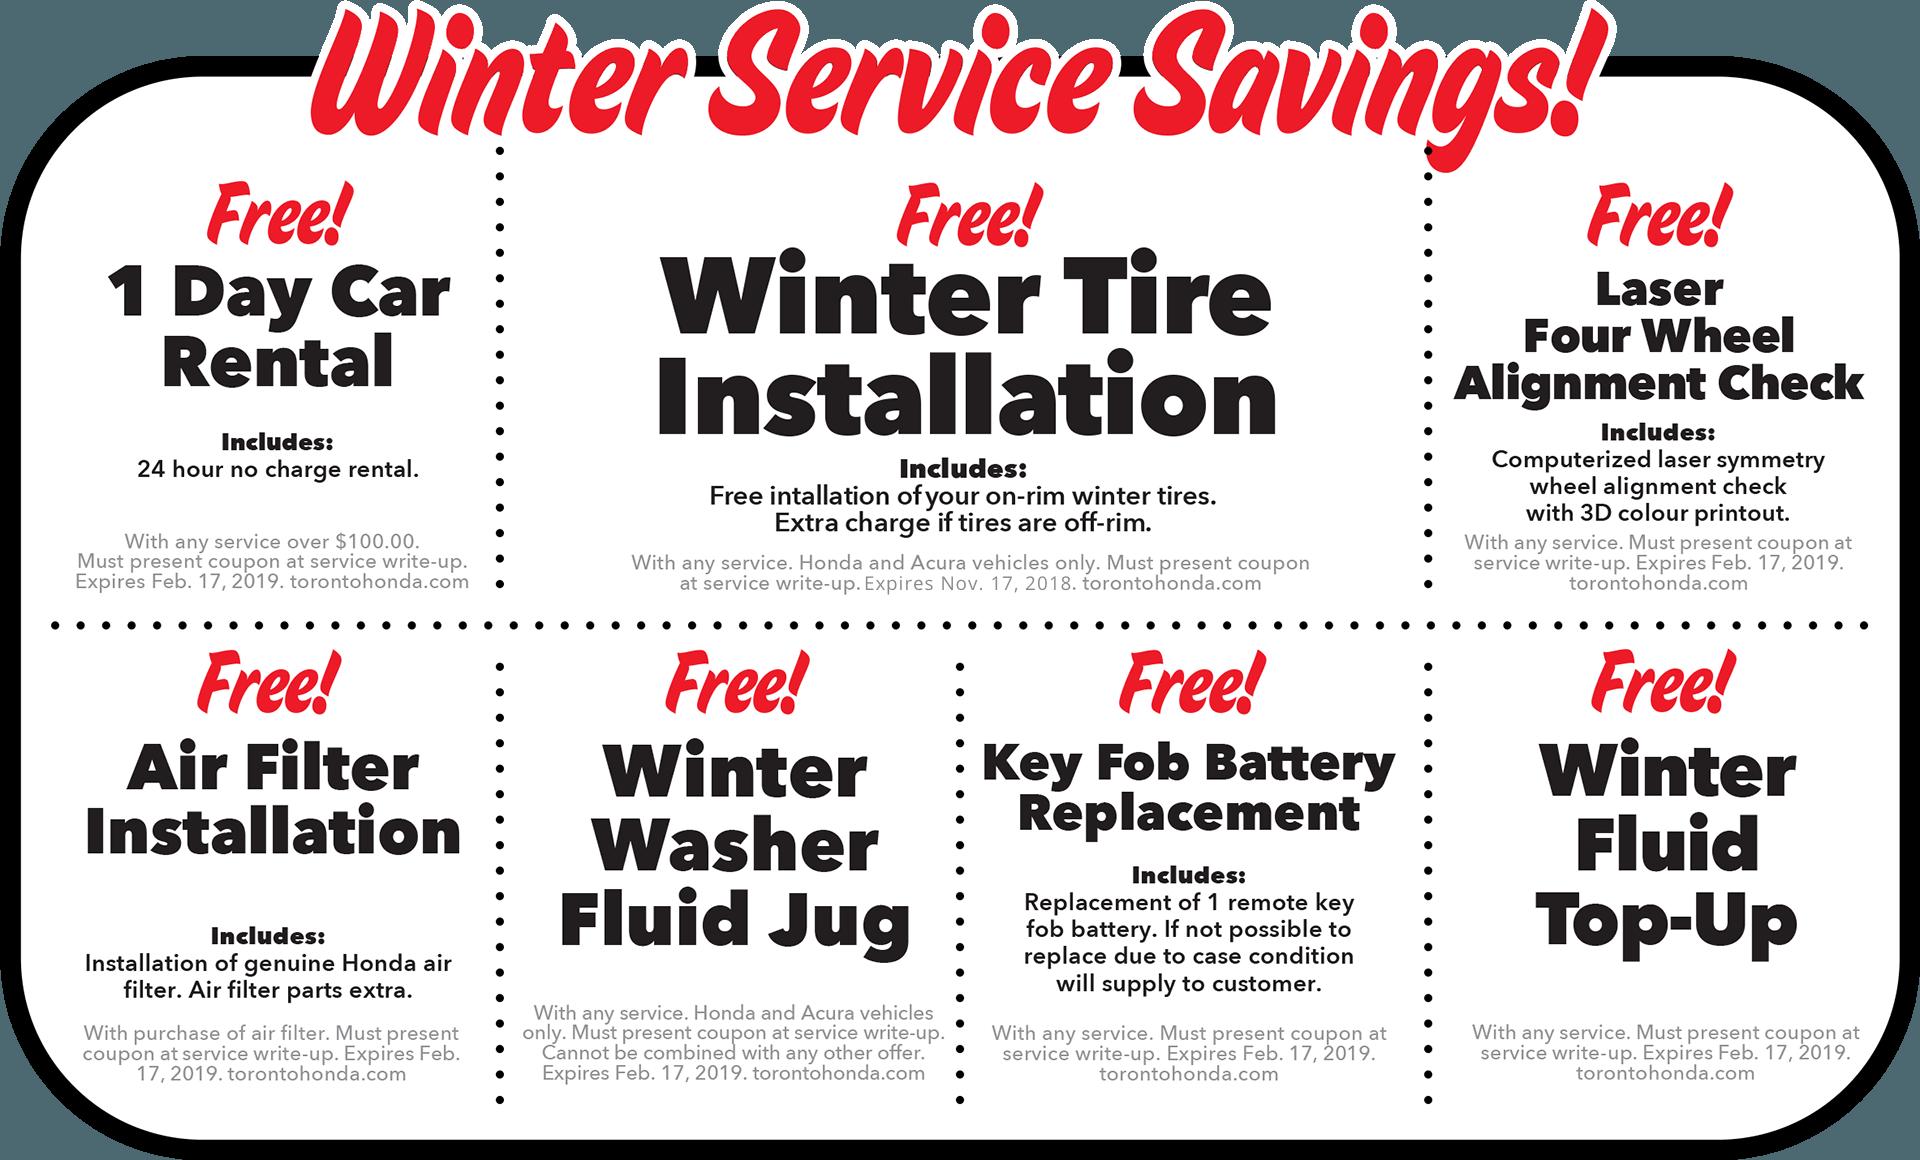 Winter Service Savings!